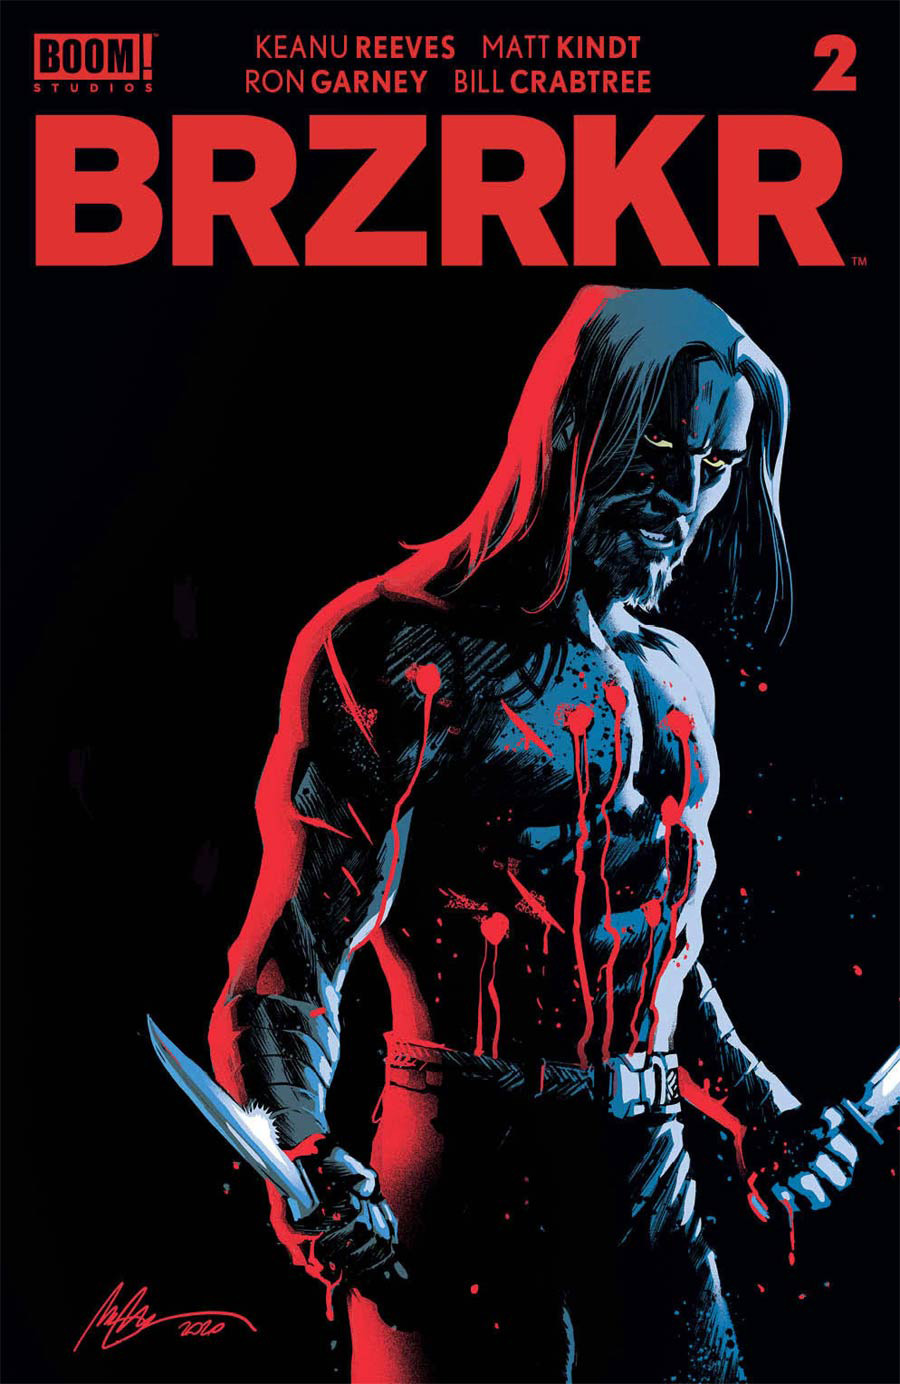 BRZRKR (Berzerker) #2 Cover B Variant Rafael Albuquerque Cover